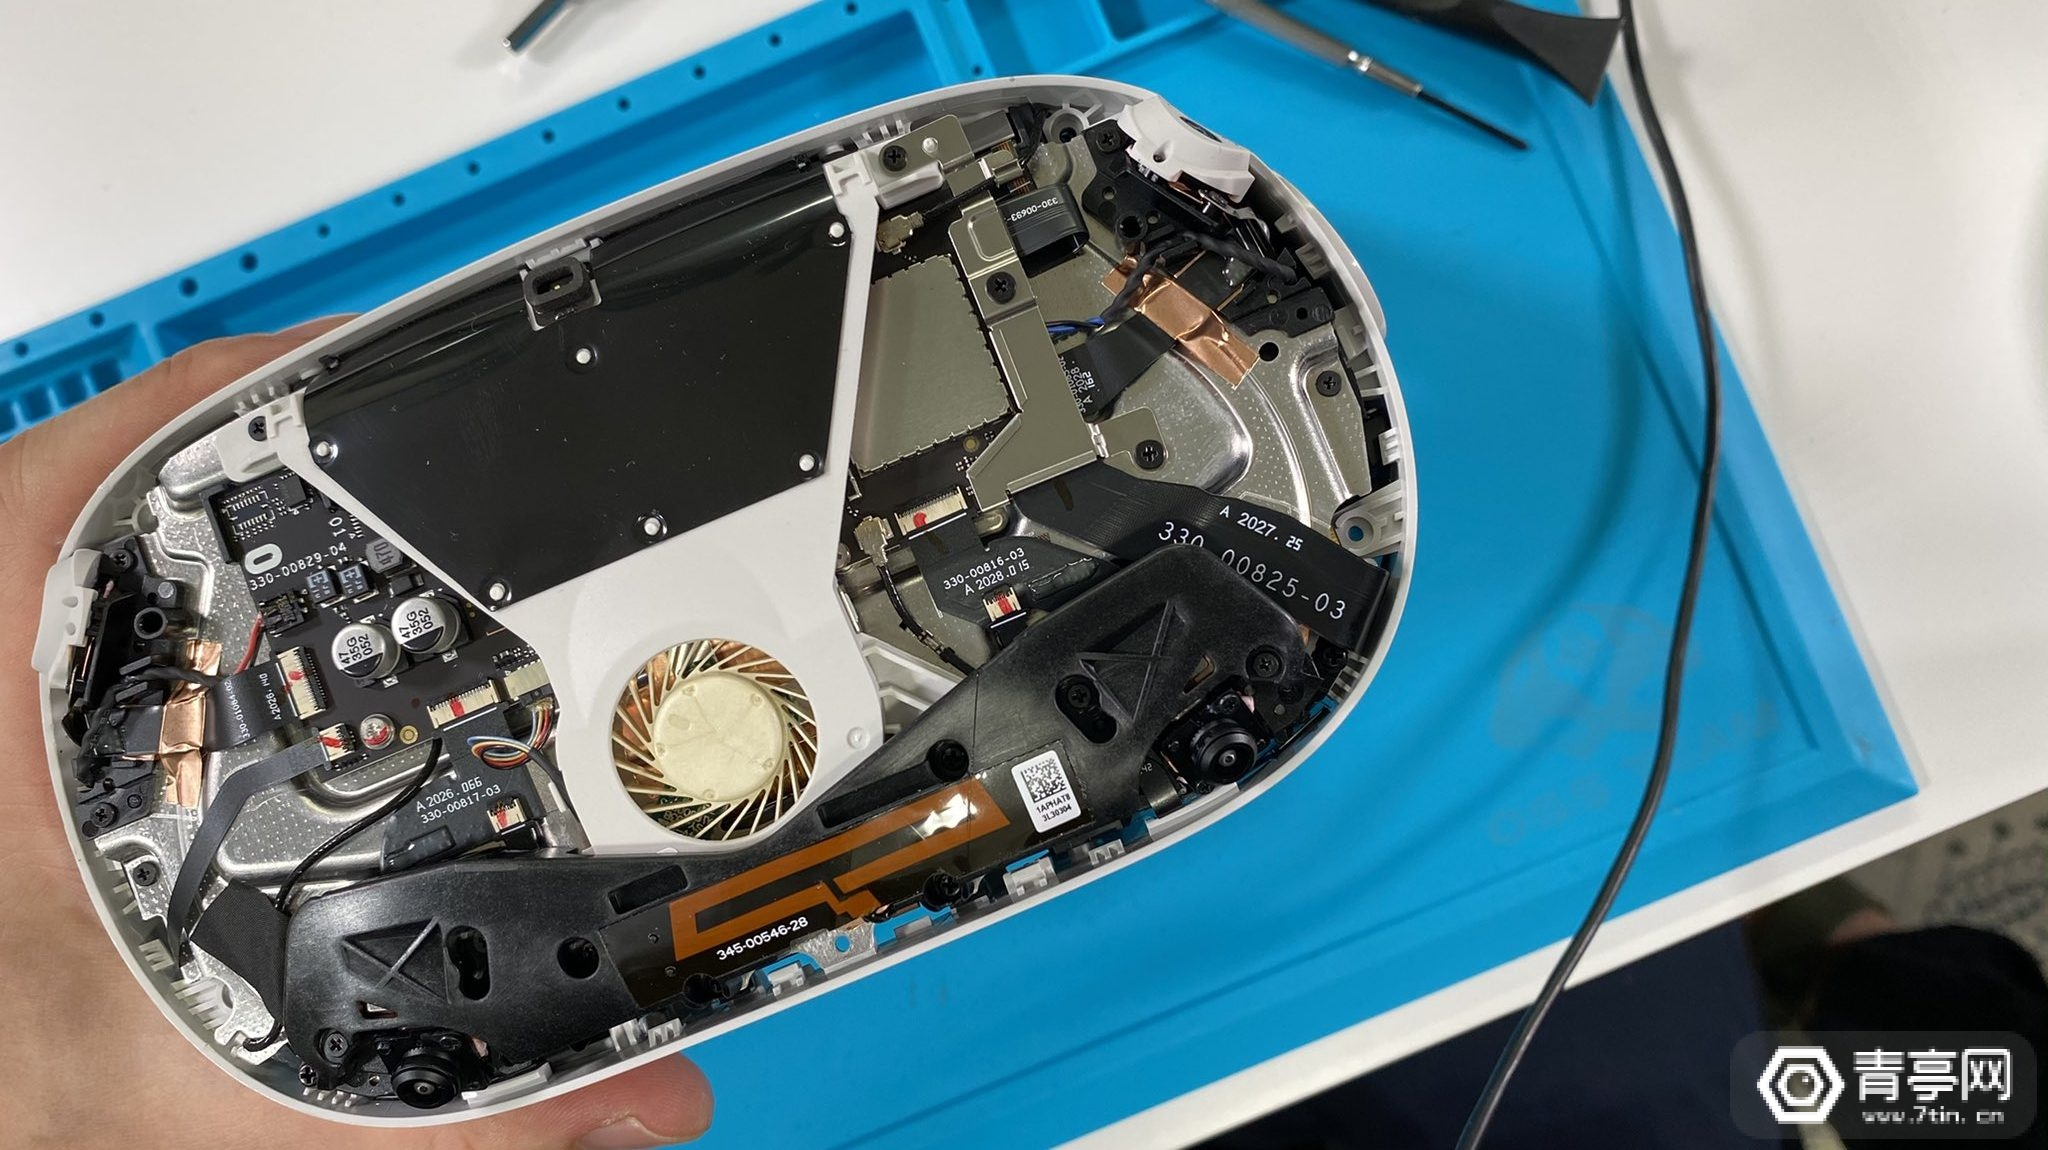 Quest 2拆解:内部结构更紧凑,散热系统升级